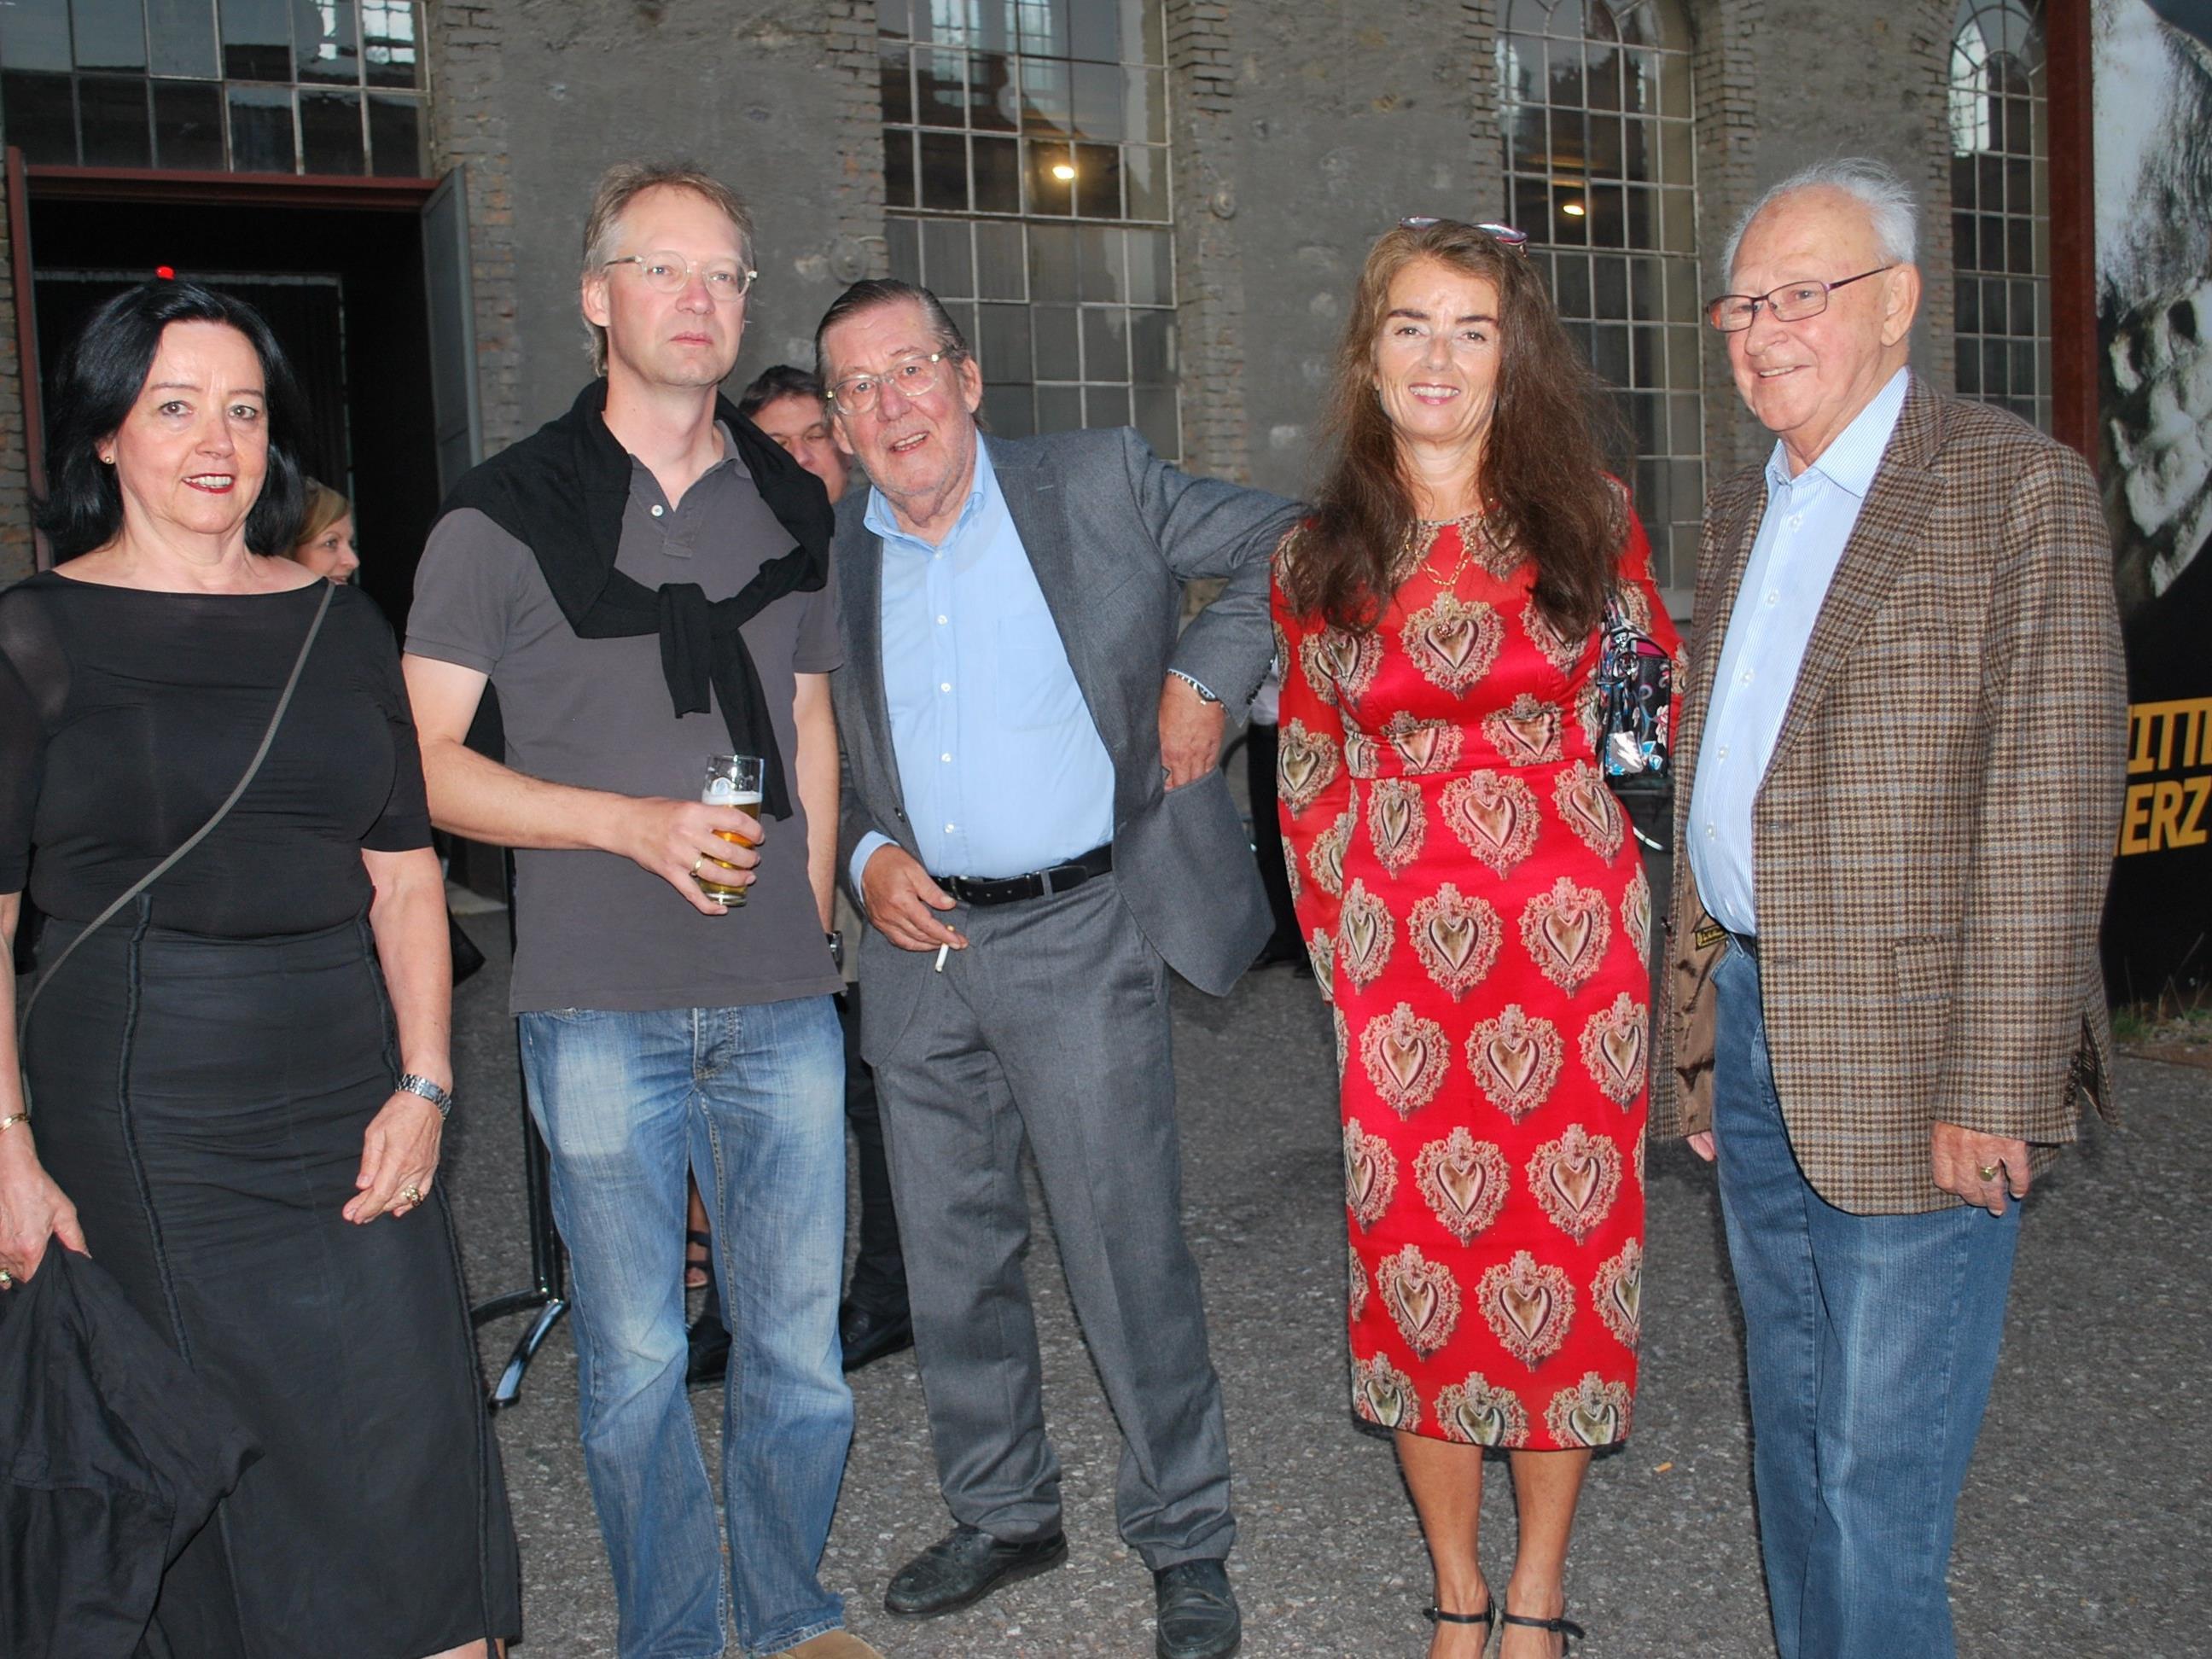 Sylvia Taraba, Georg Bechtold, Gottfried Bechtold, Ingrid Adamer, Guntram Bechtold